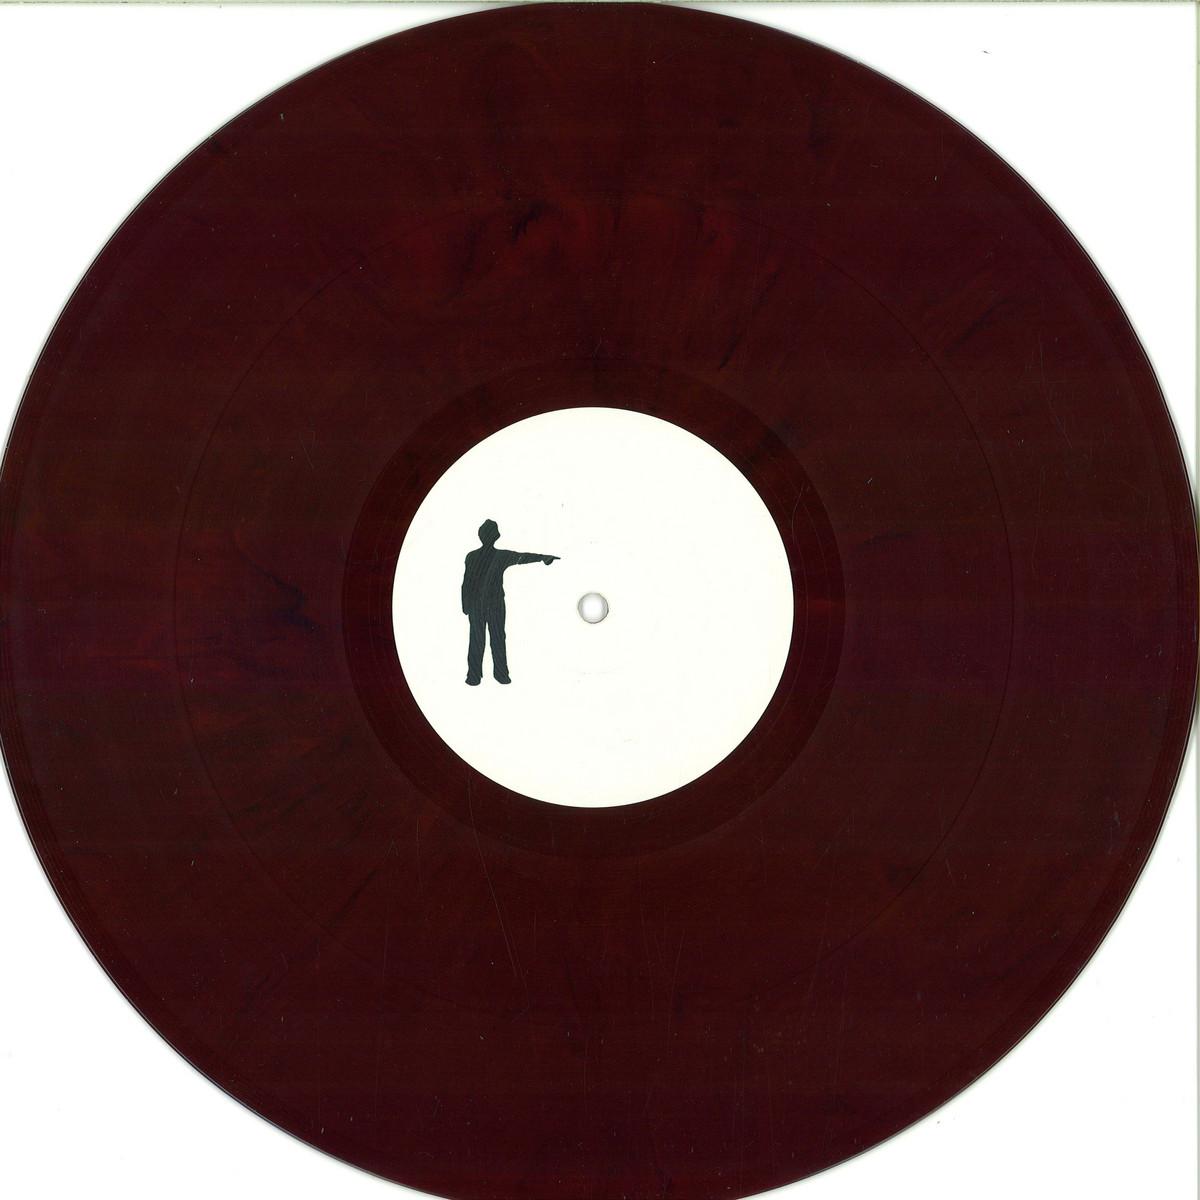 East End Dubs Tools Volume 1 East End Dubs Eedv001 Vinyl